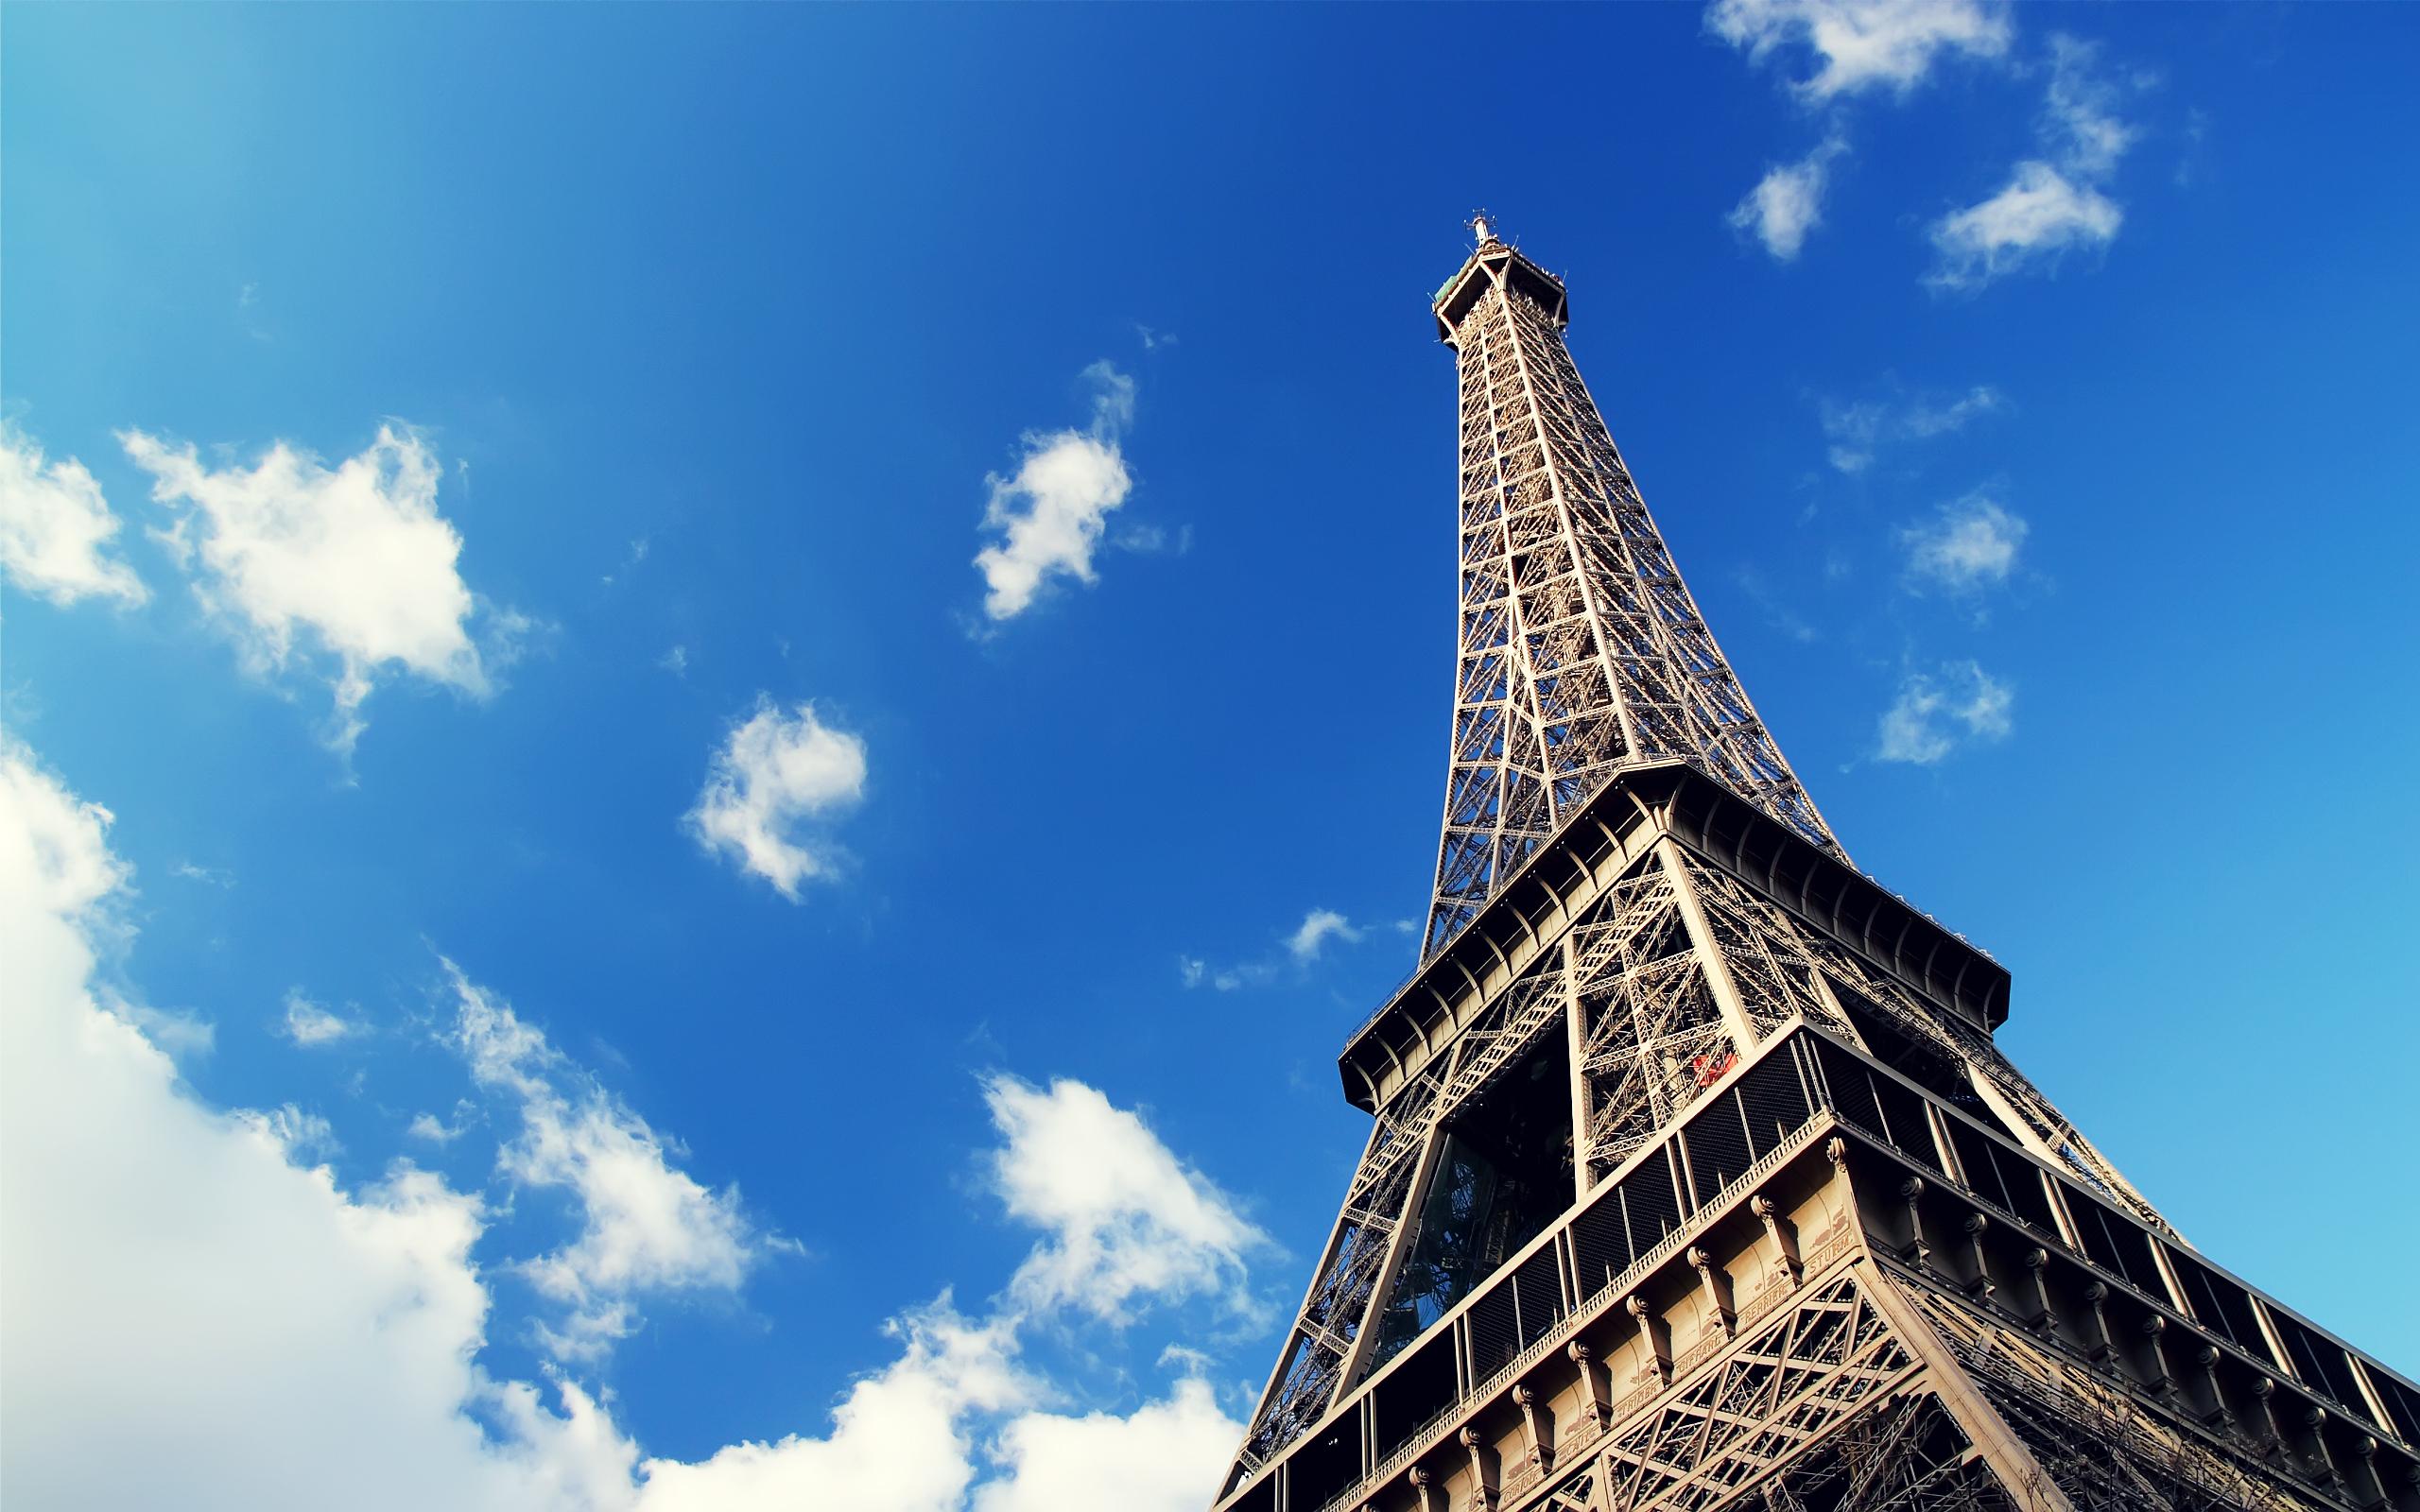 Cute Eiffel Tower Wallpaper: HD Wallpapers Paris